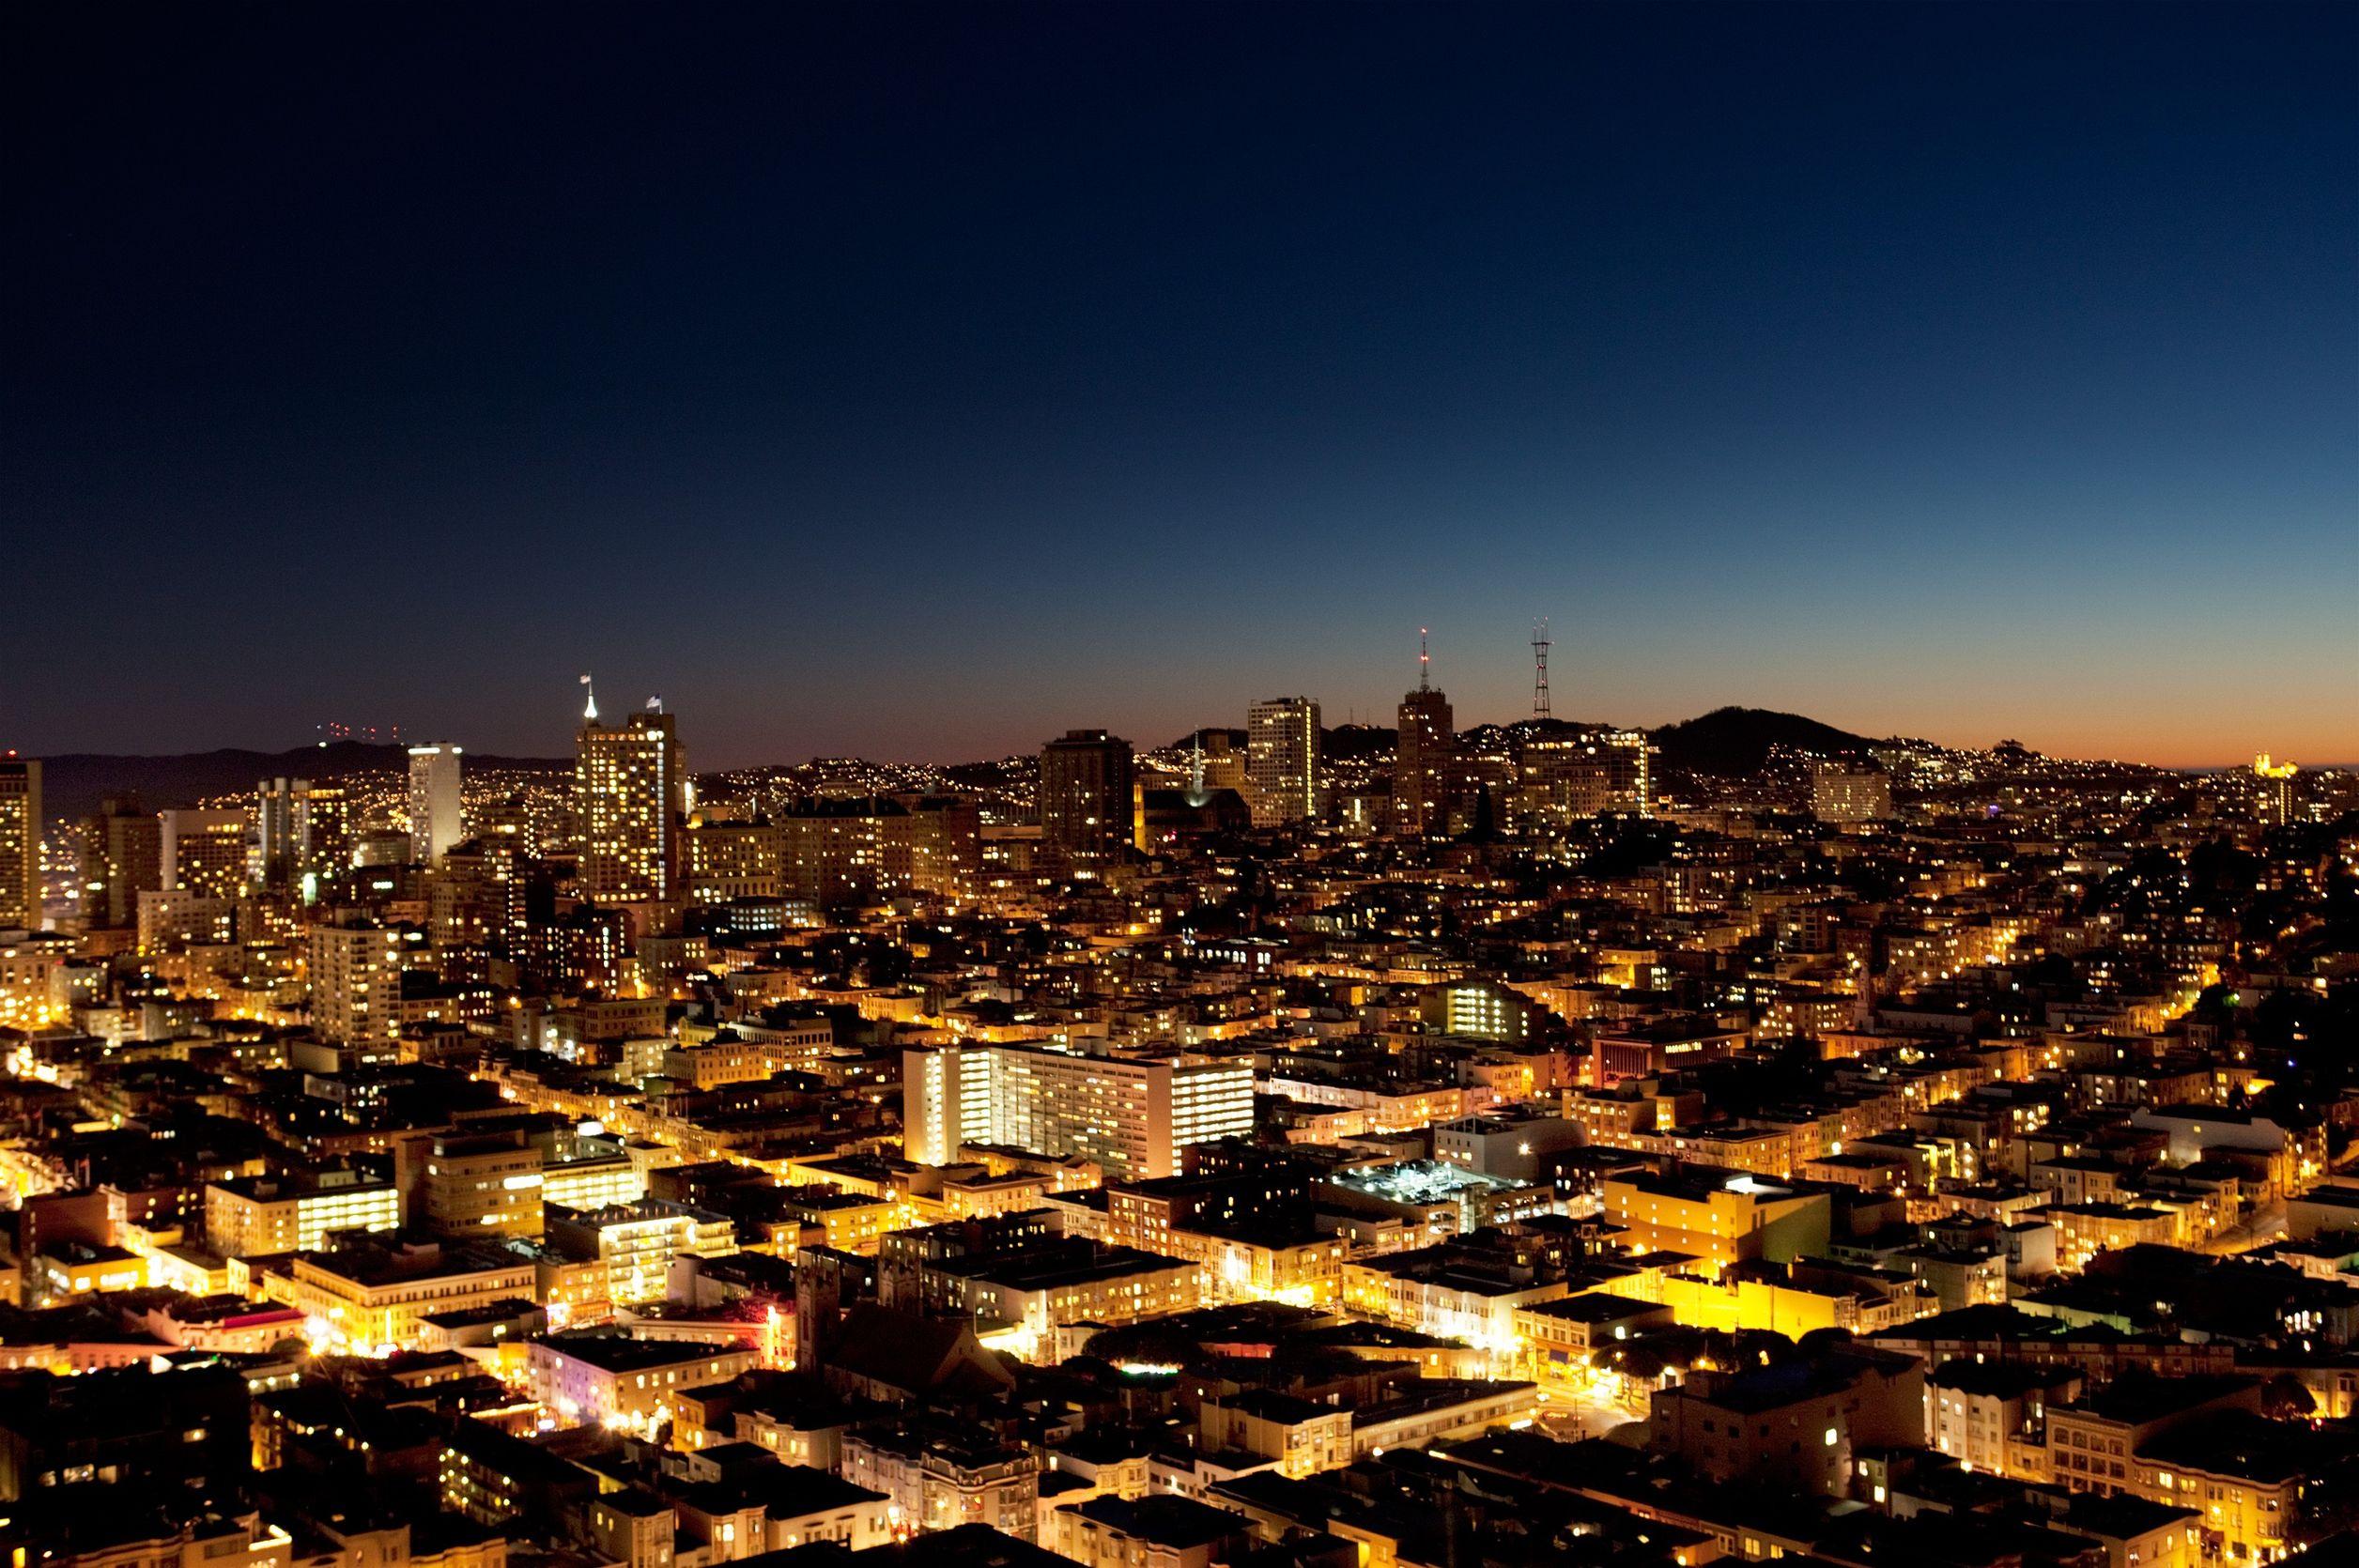 A photo of the San Jose skyline at dusk